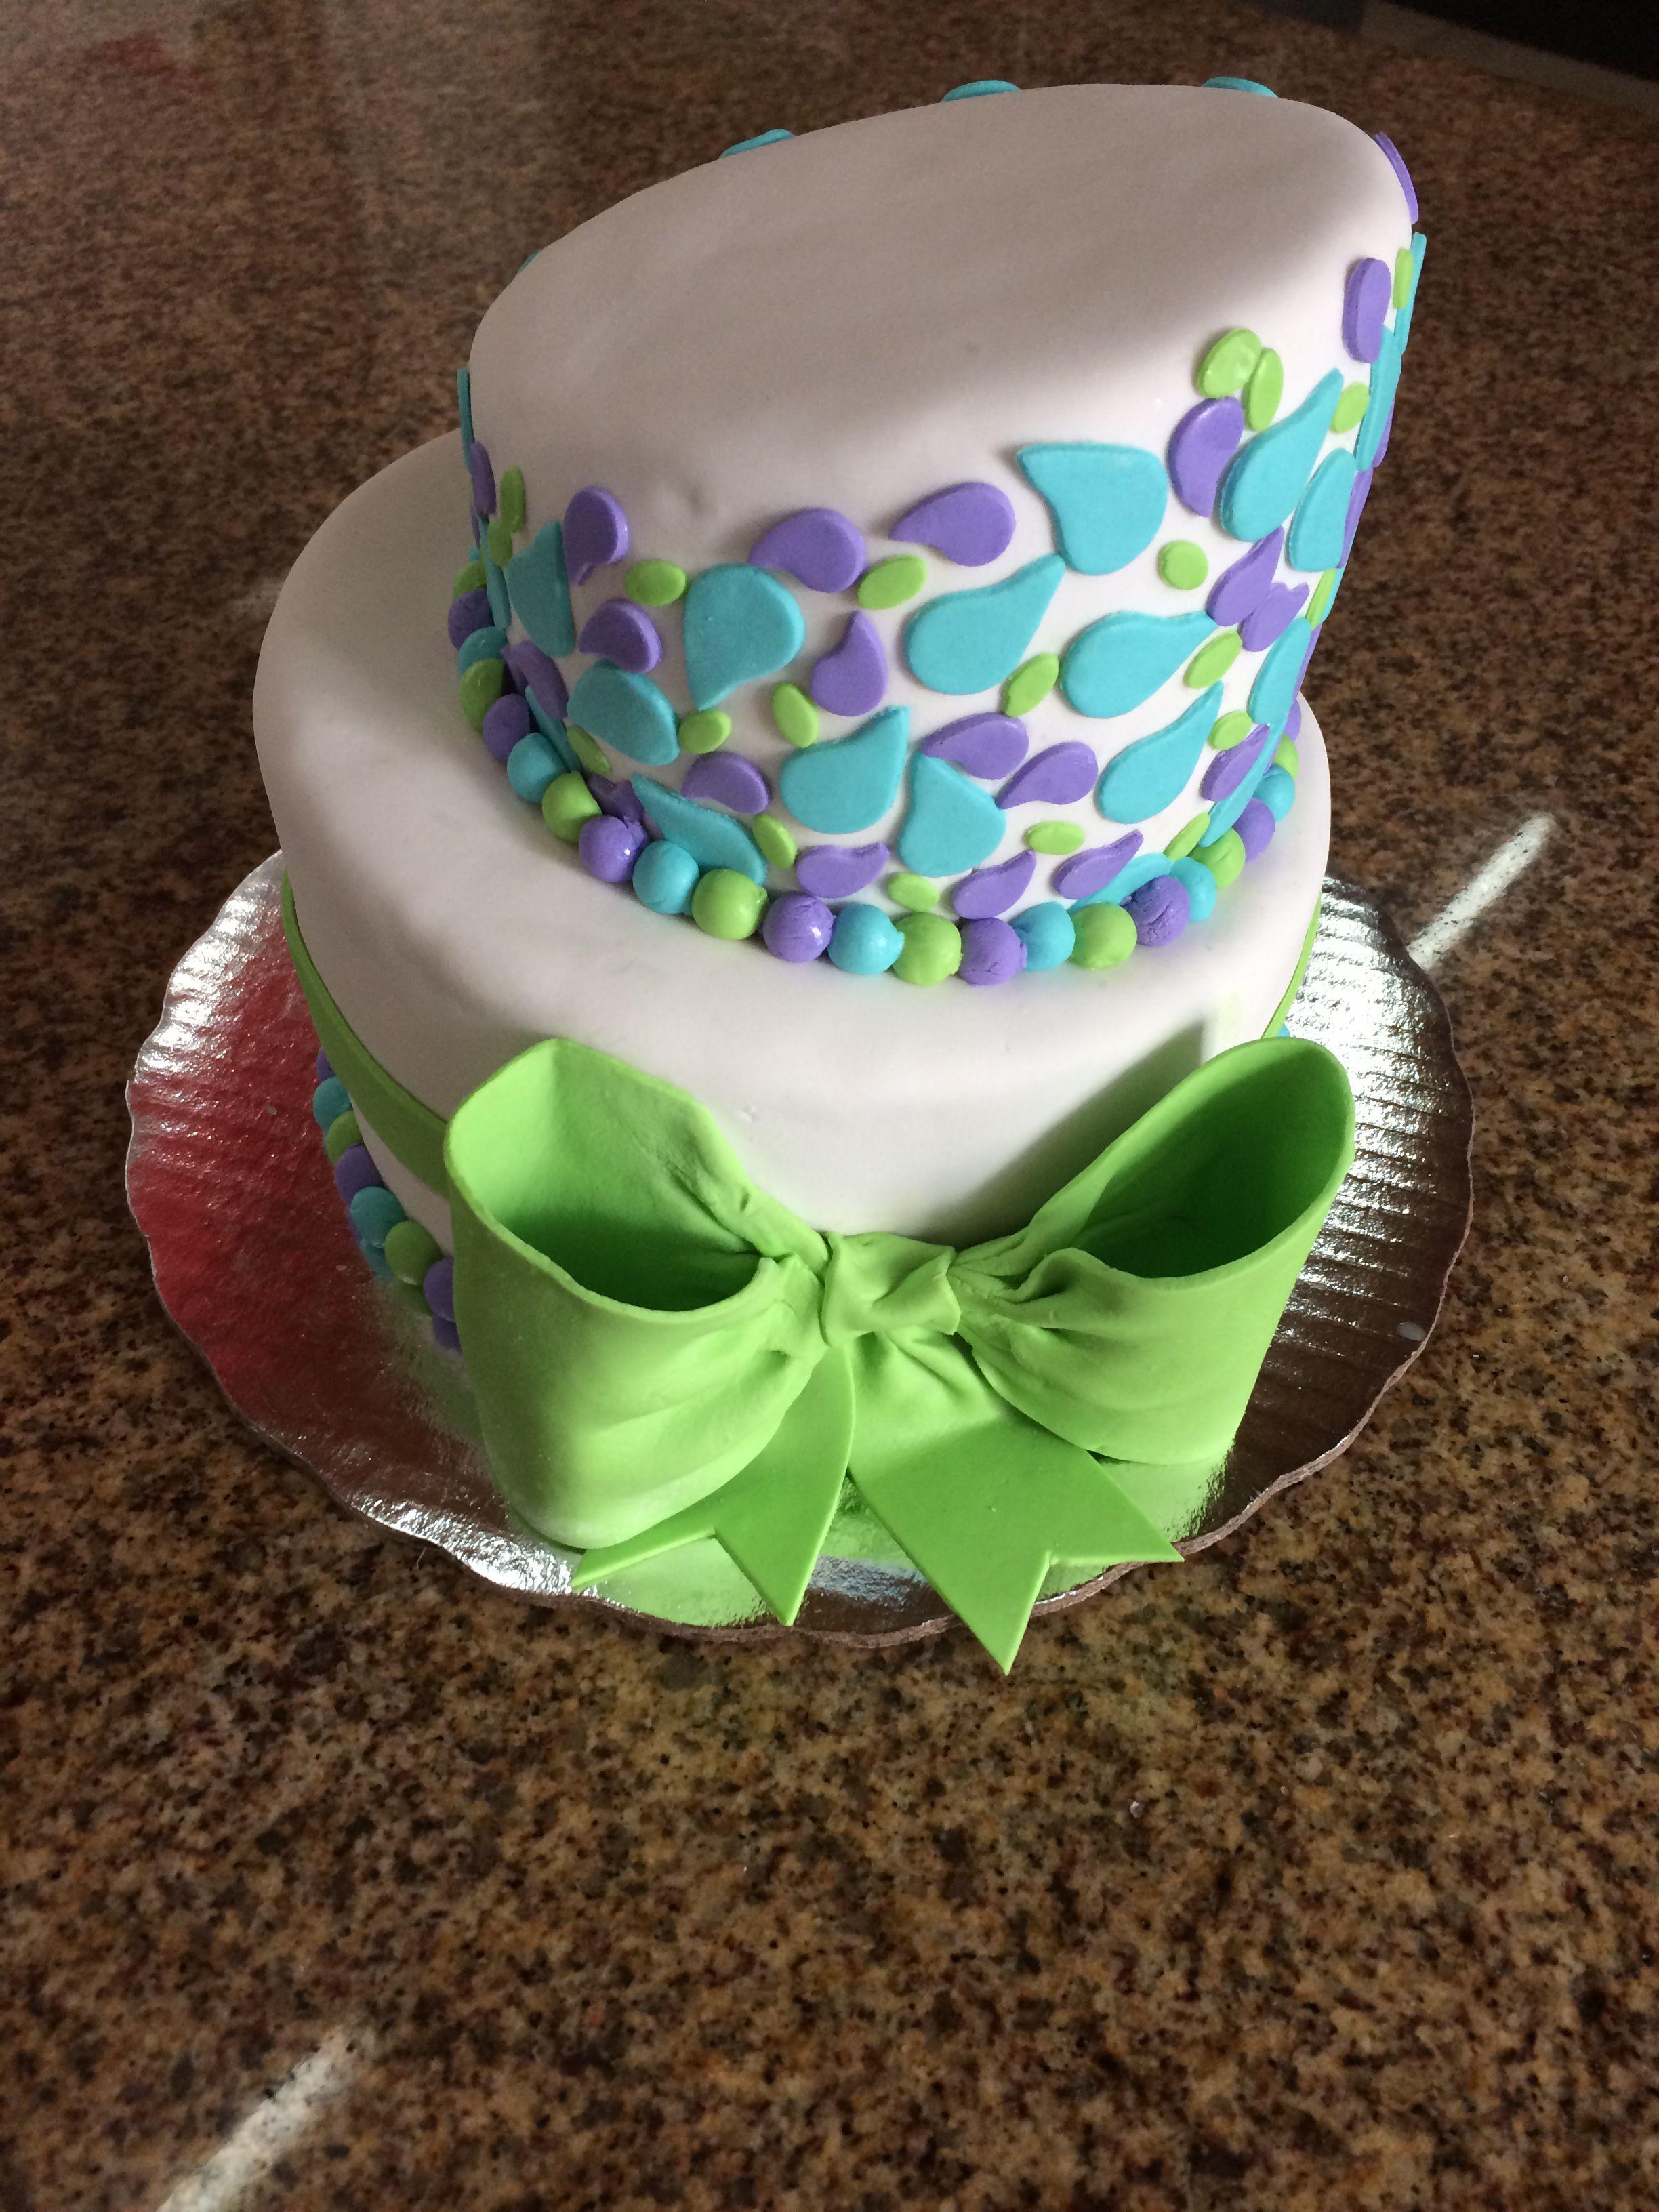 Turvy Cakes